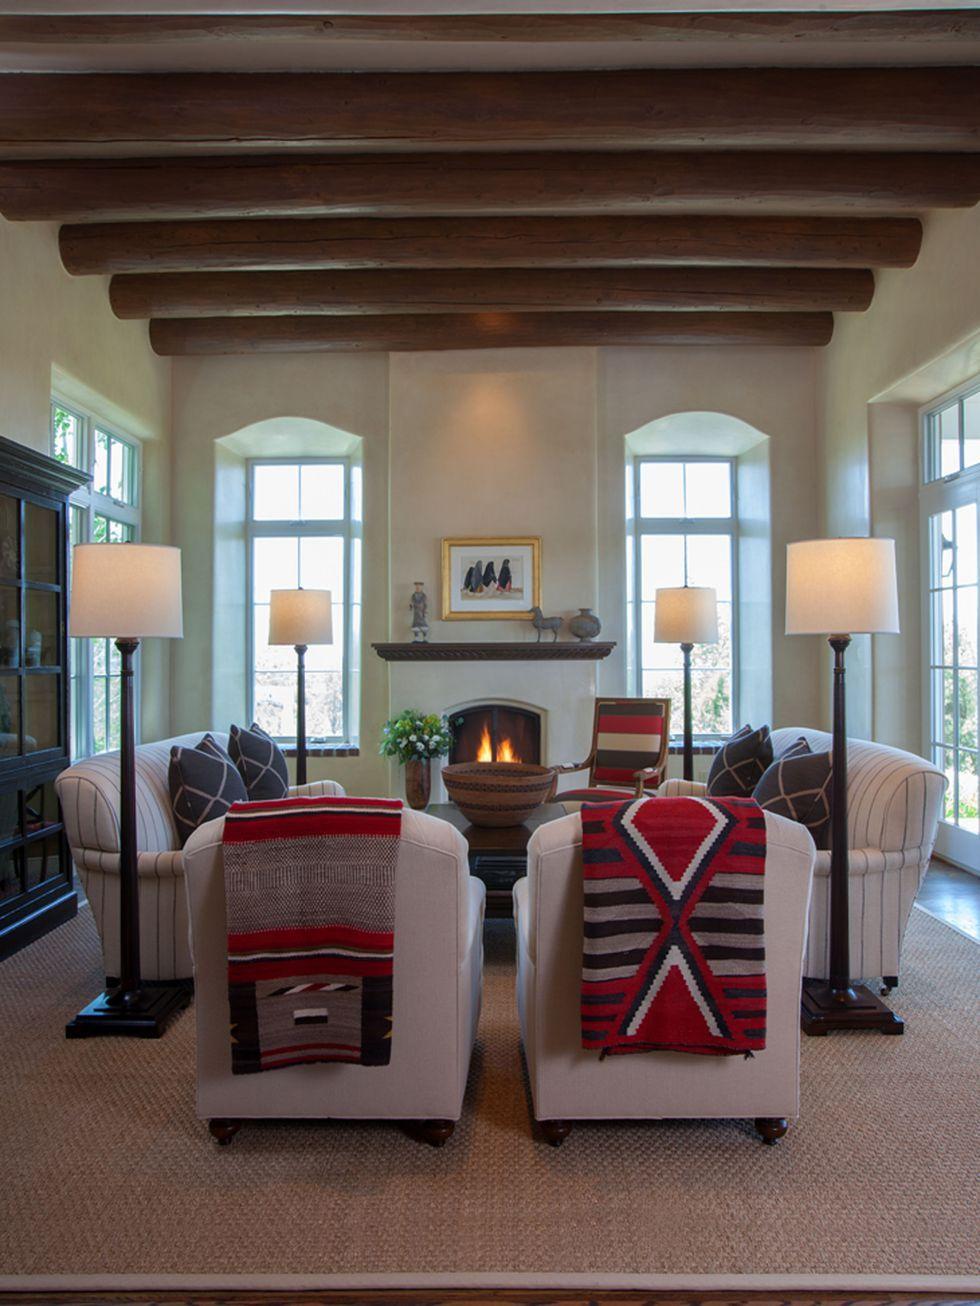 Step Inside A Stunning Adobe Home In Santa Fe Az House